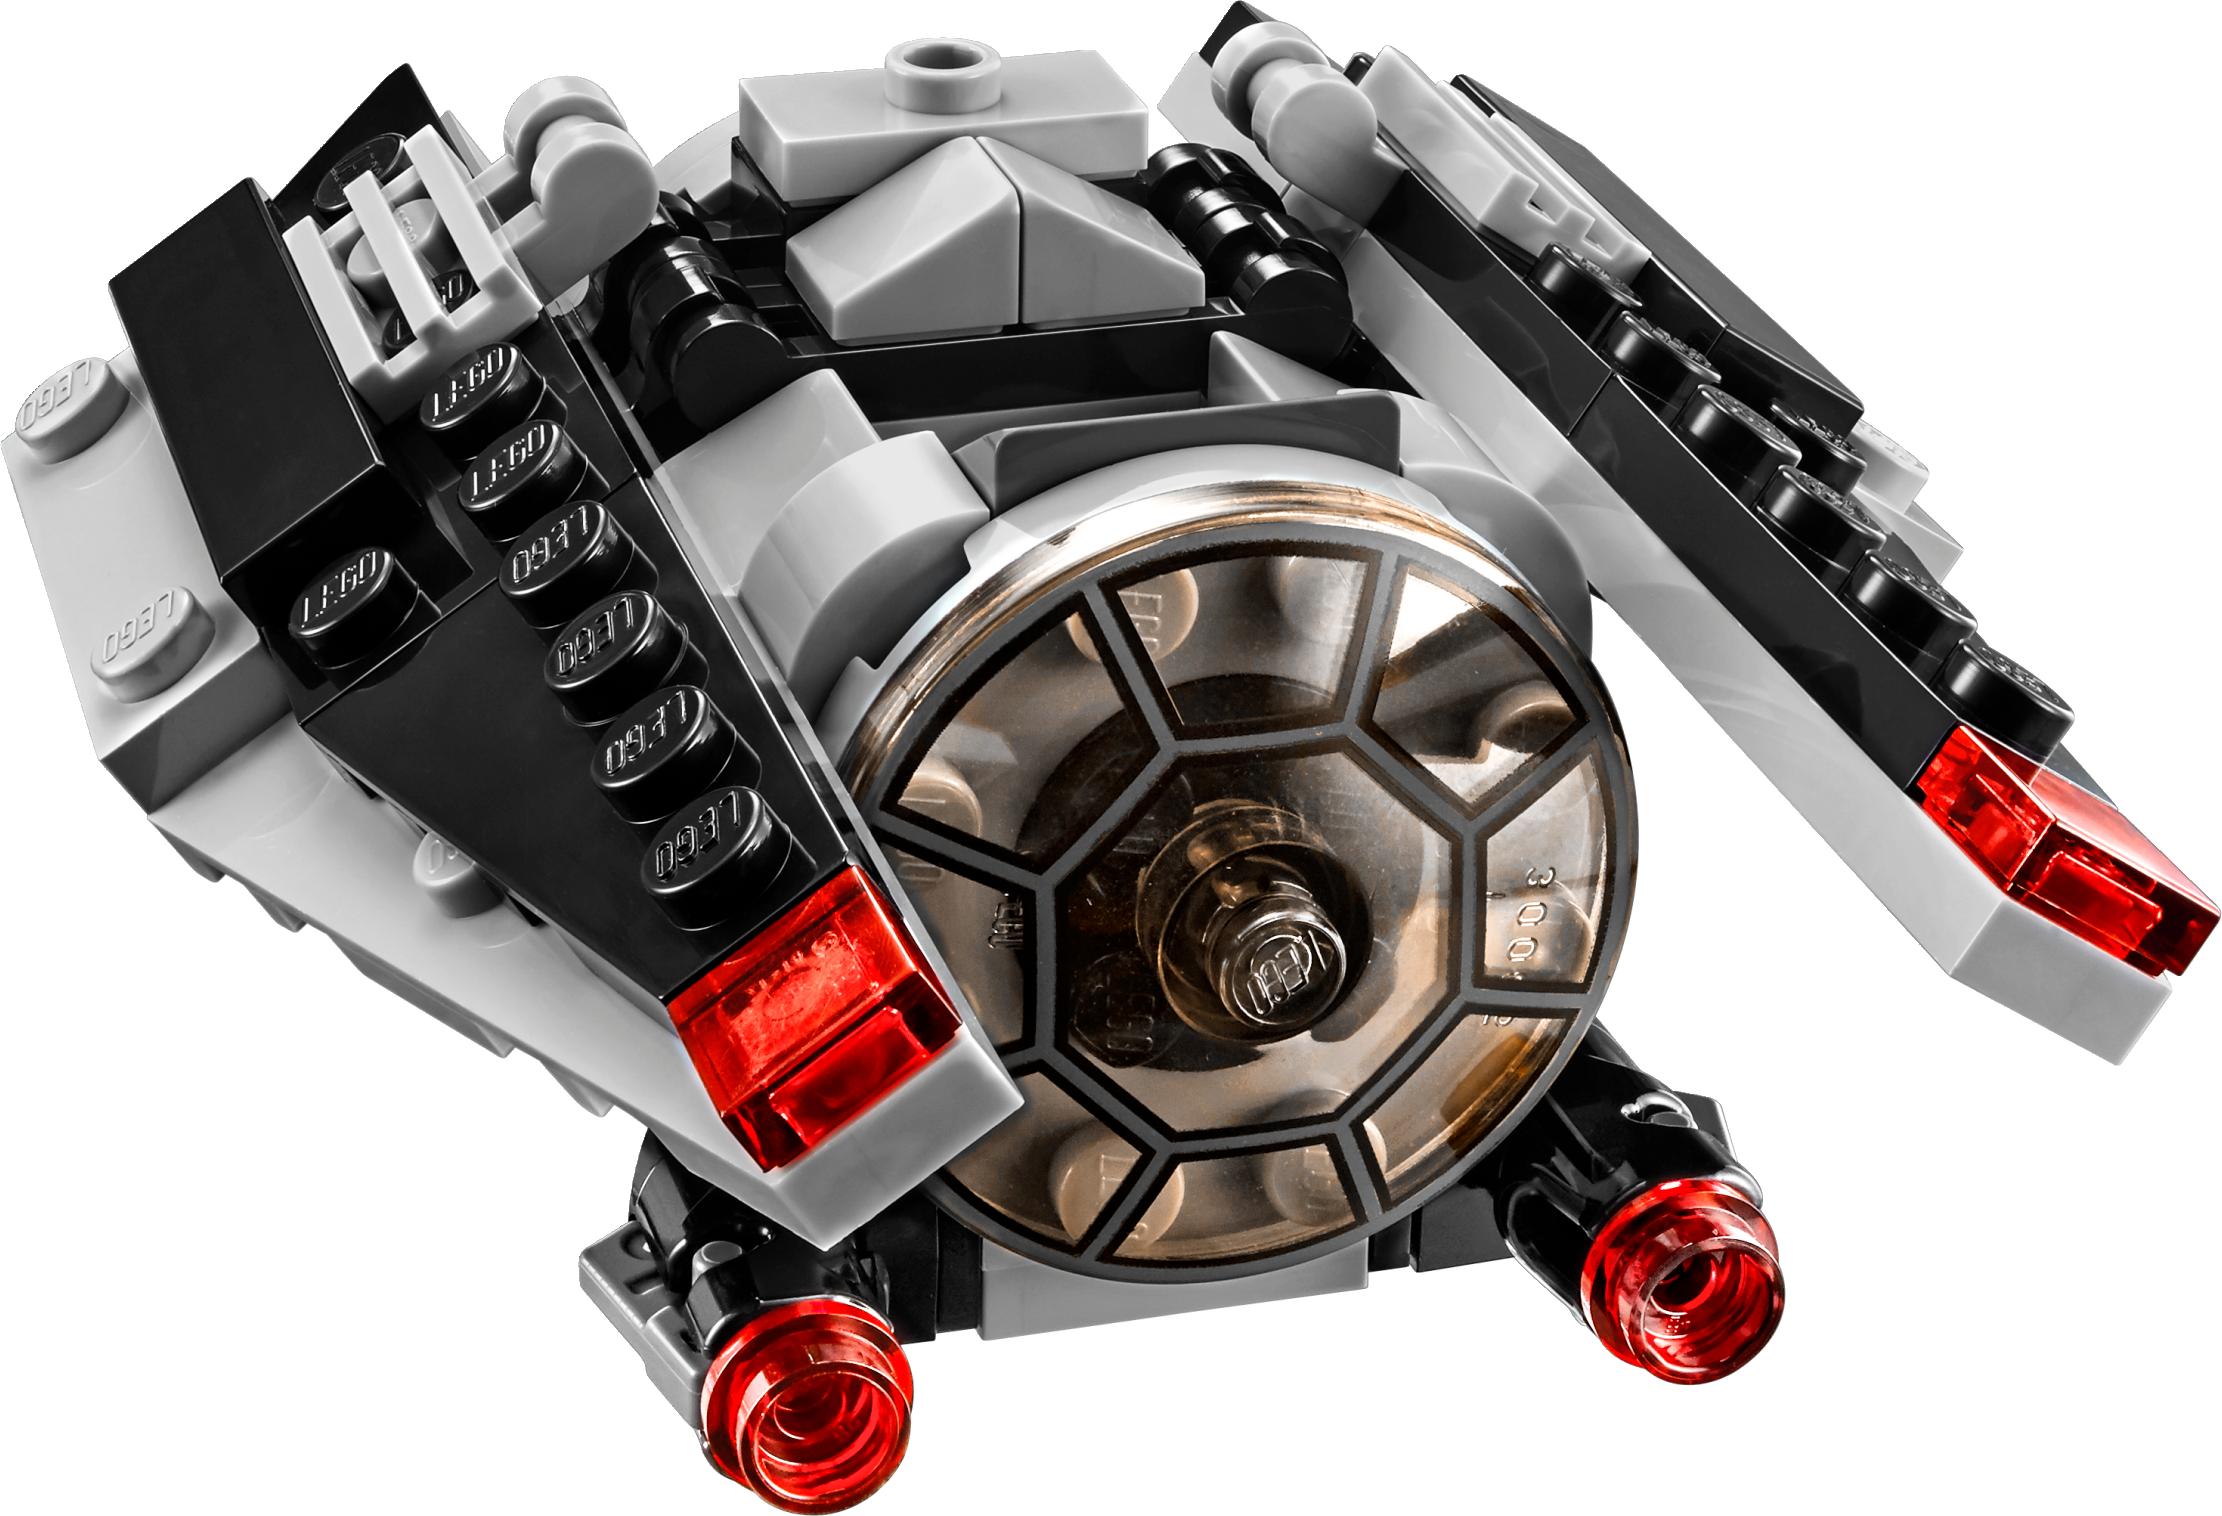 TIE Striker™ Microfighter